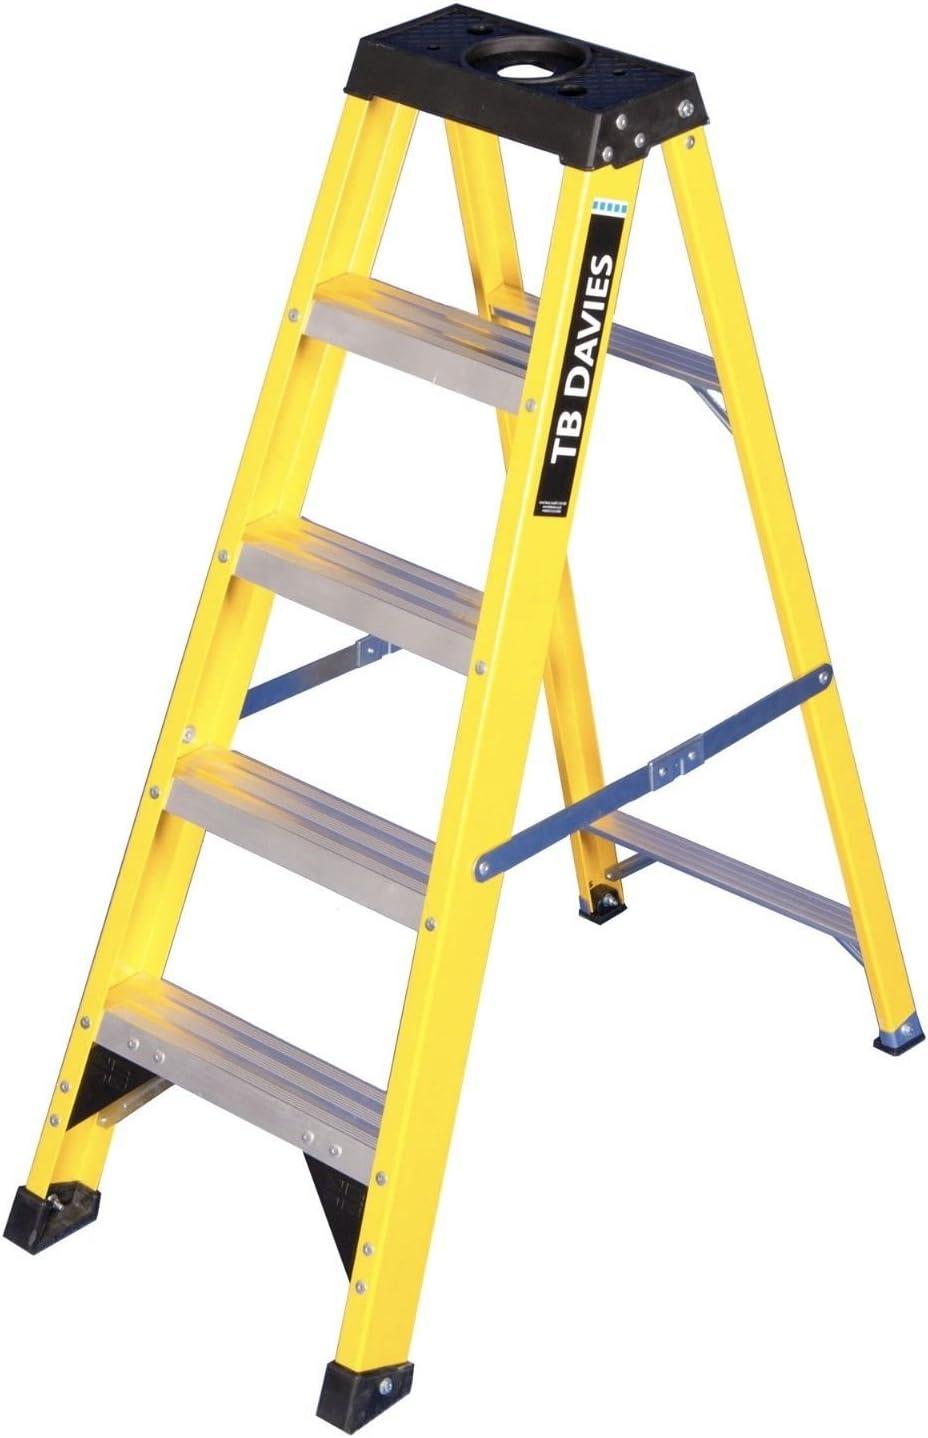 Fibra de vidrio escalera de paso escaleras – non-conductive Stiles ...